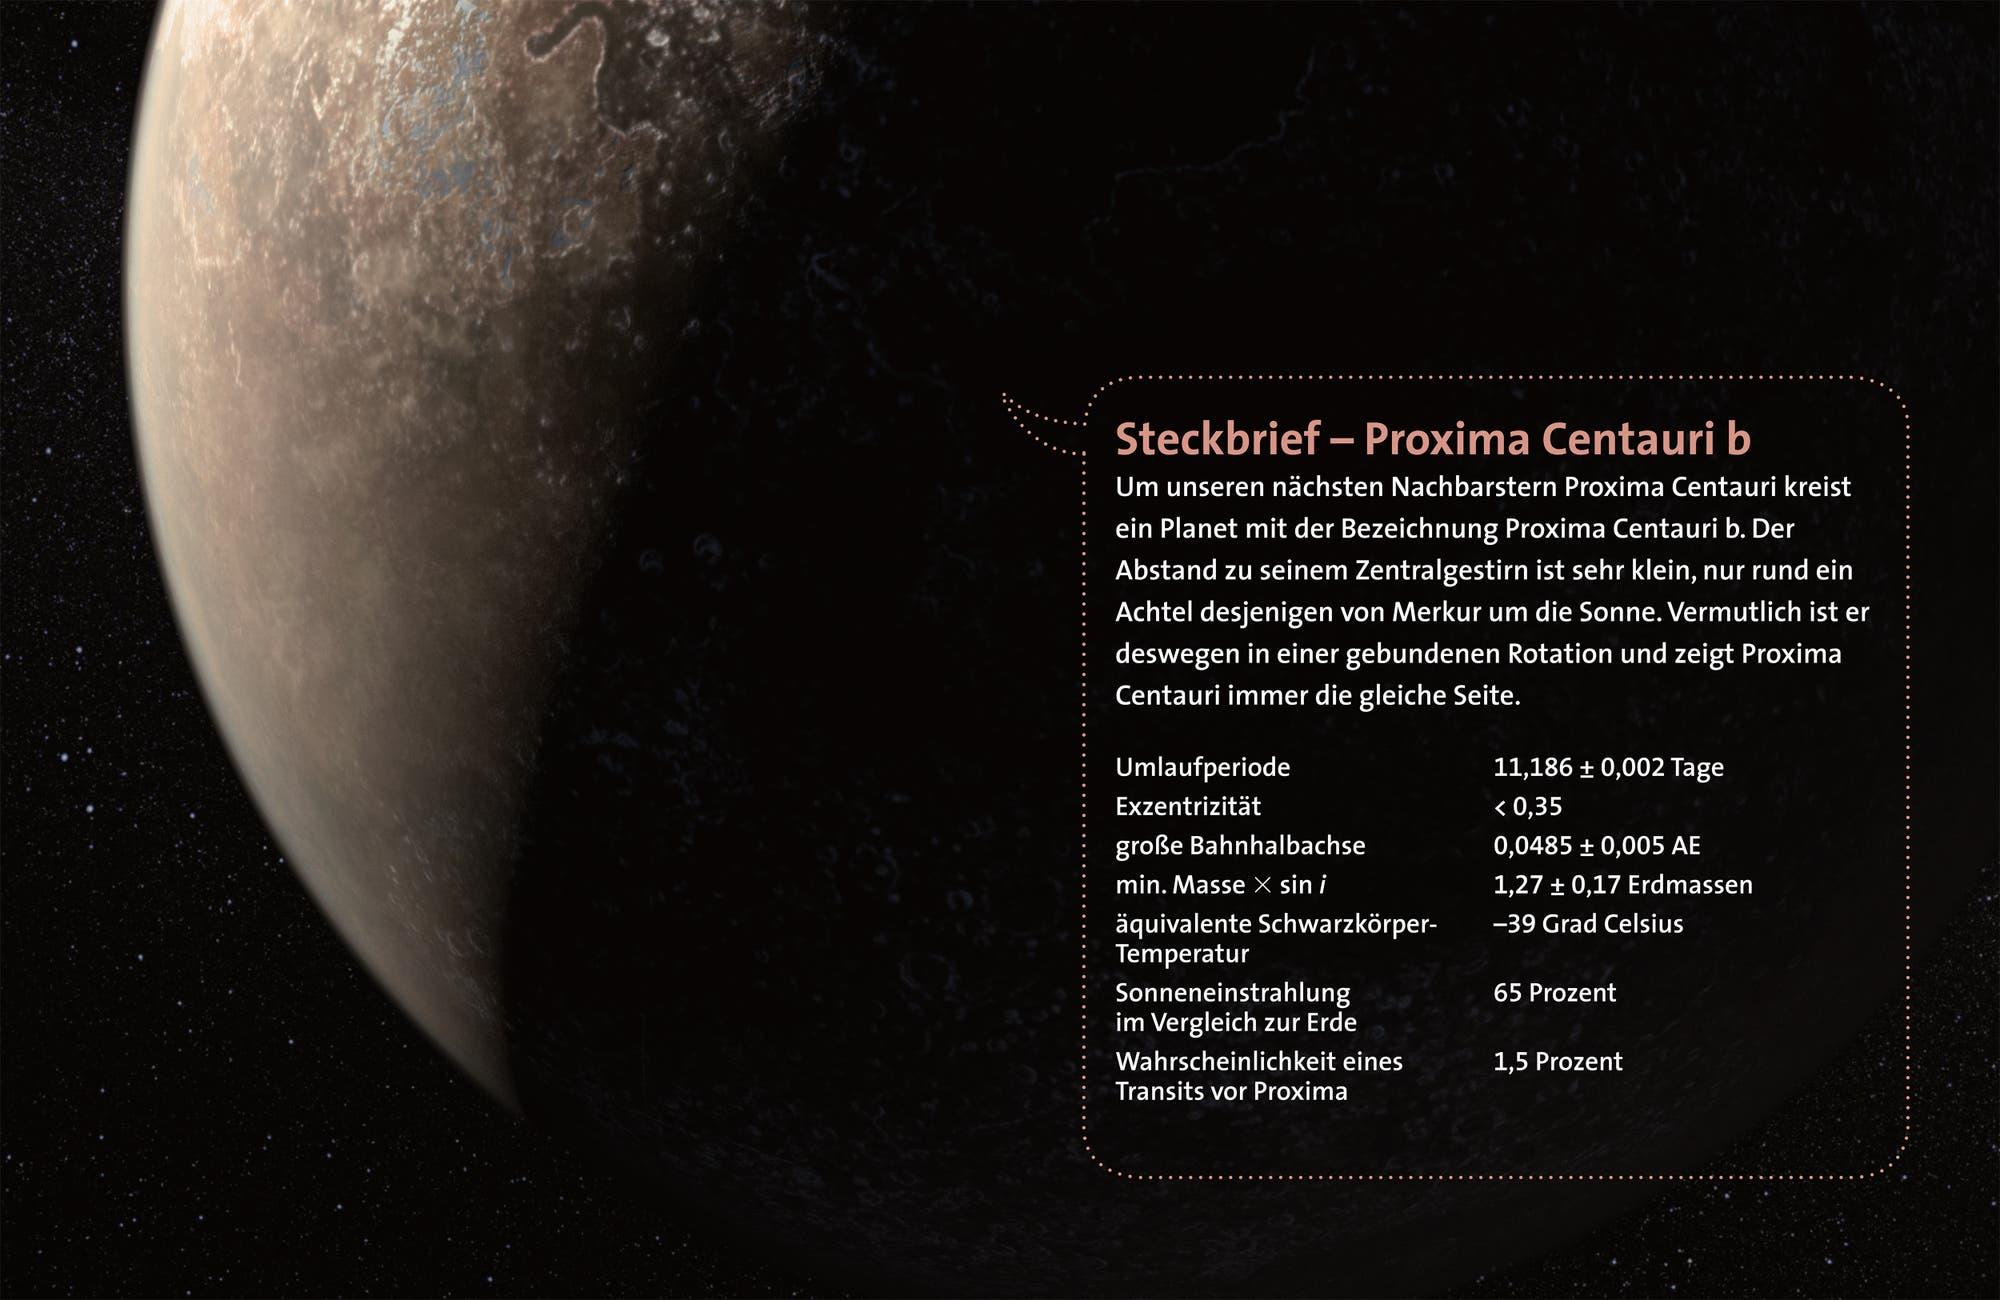 Steckbrief Planet Proxima Centauri b